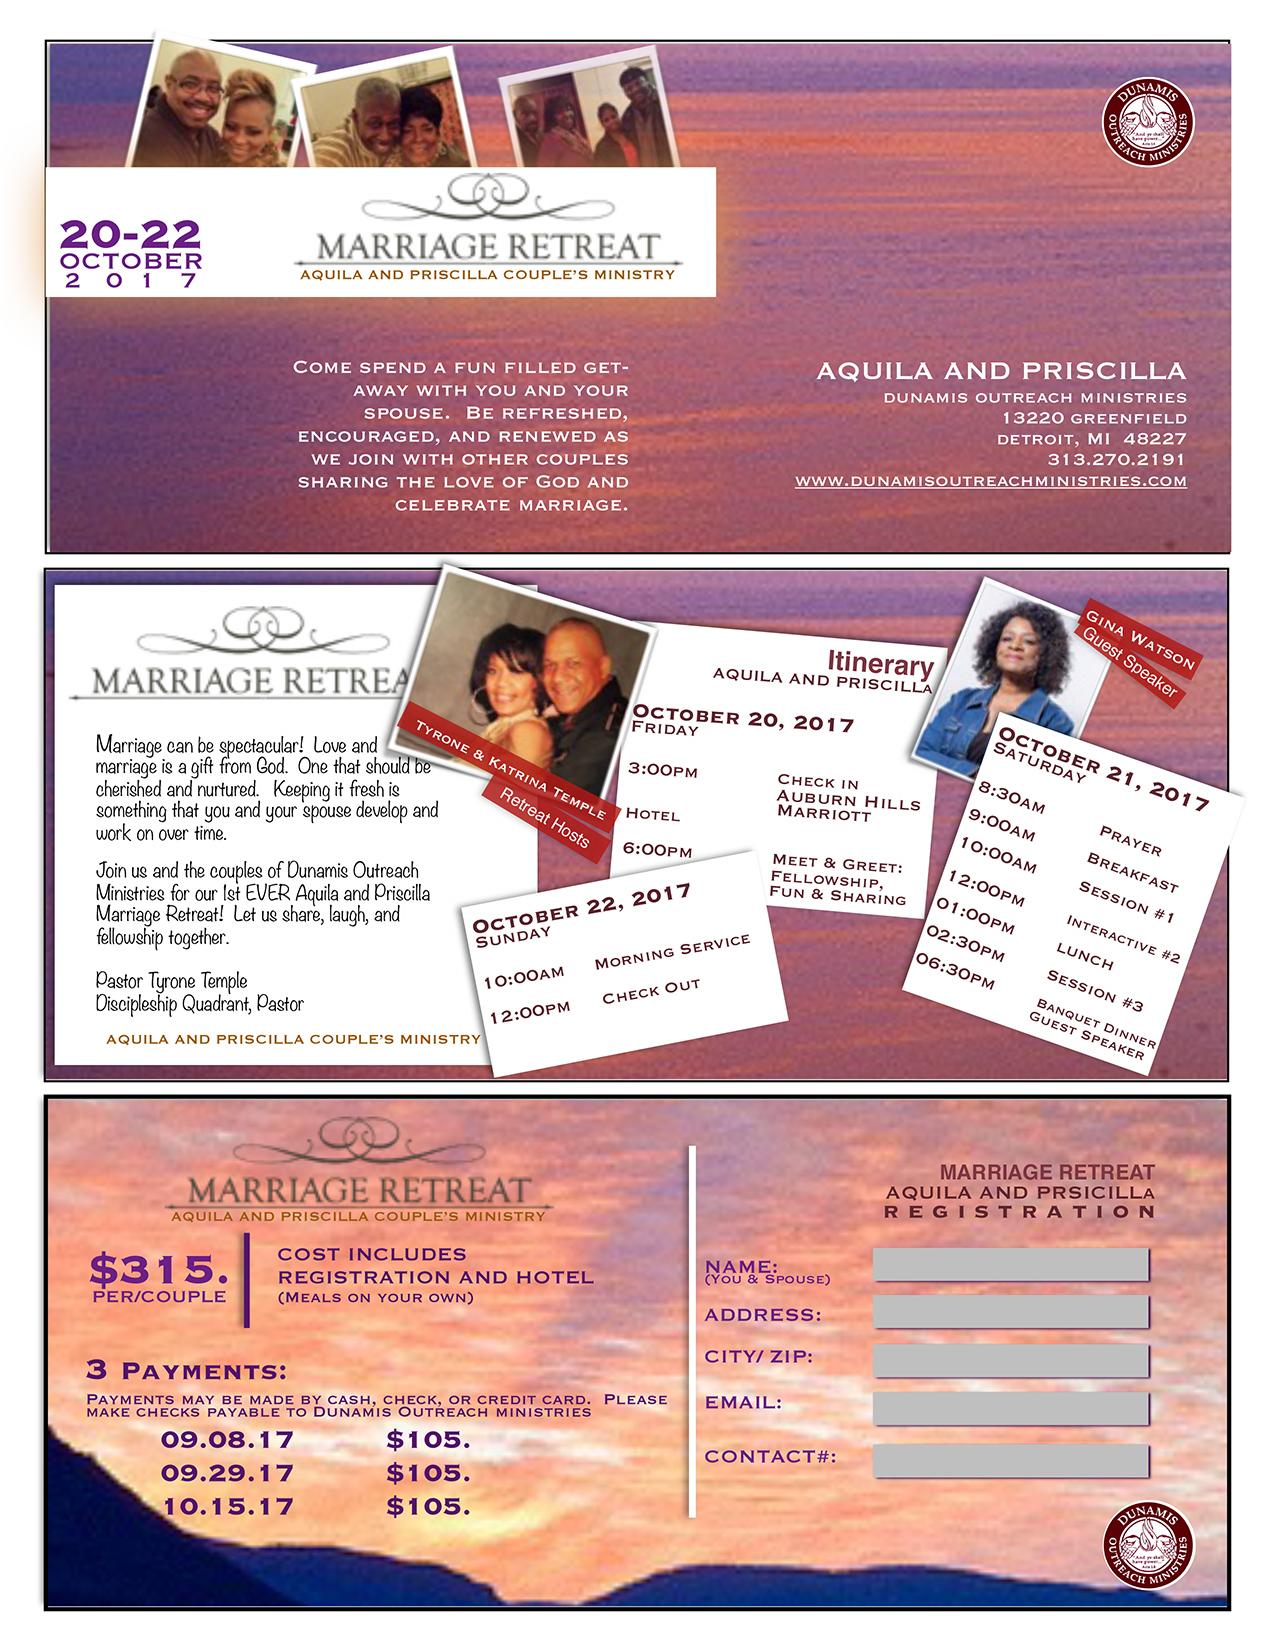 Aquila & Pricilla Marriage Retreat 2017 pg 2